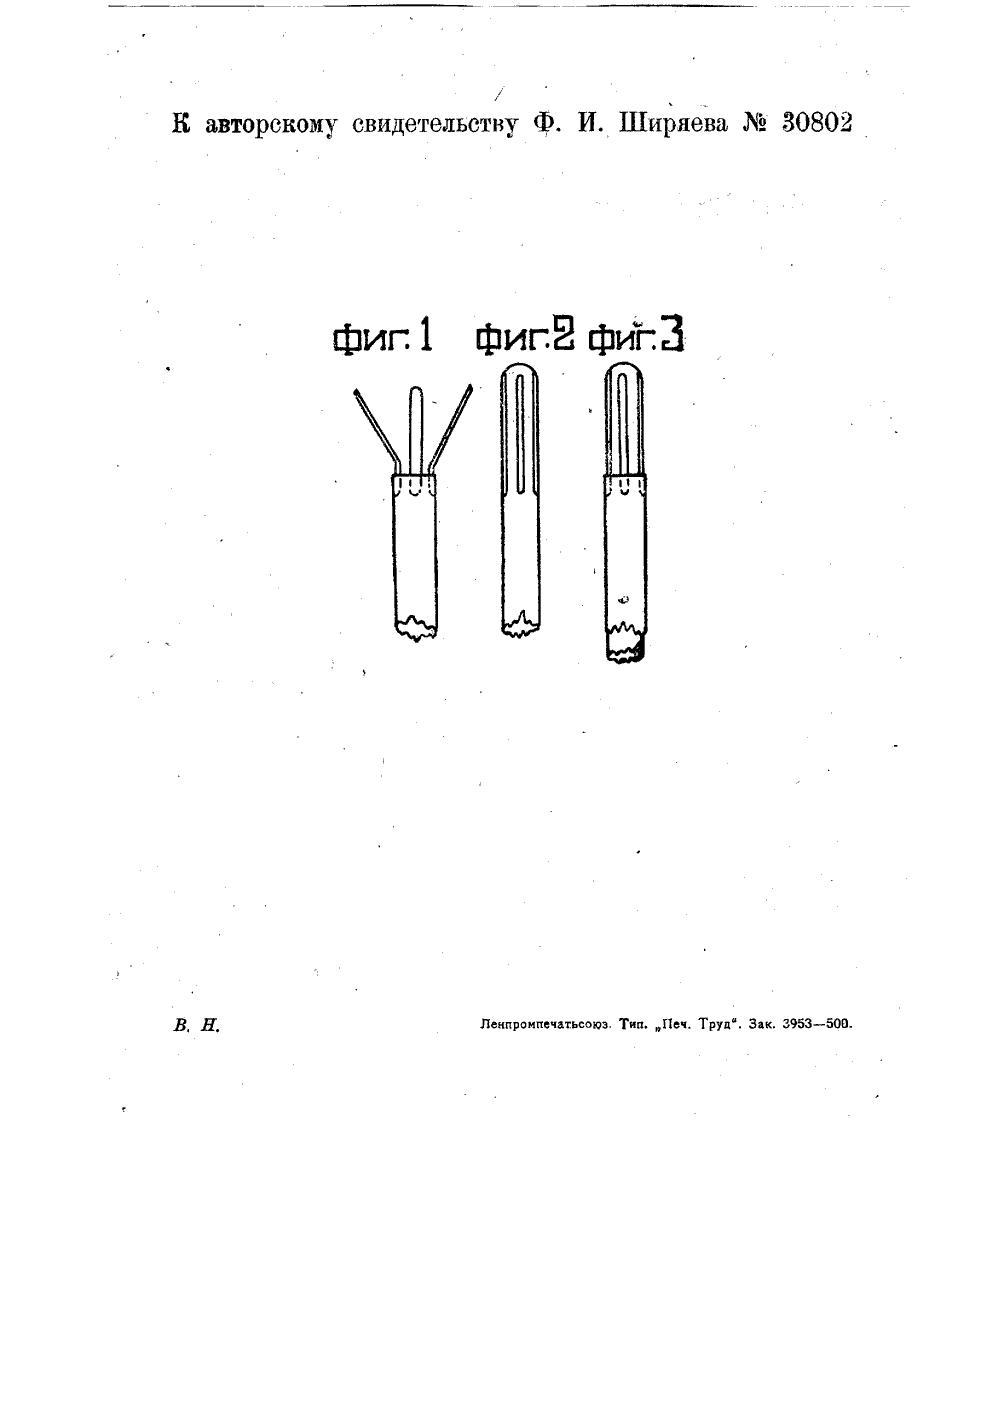 Уретроскоп